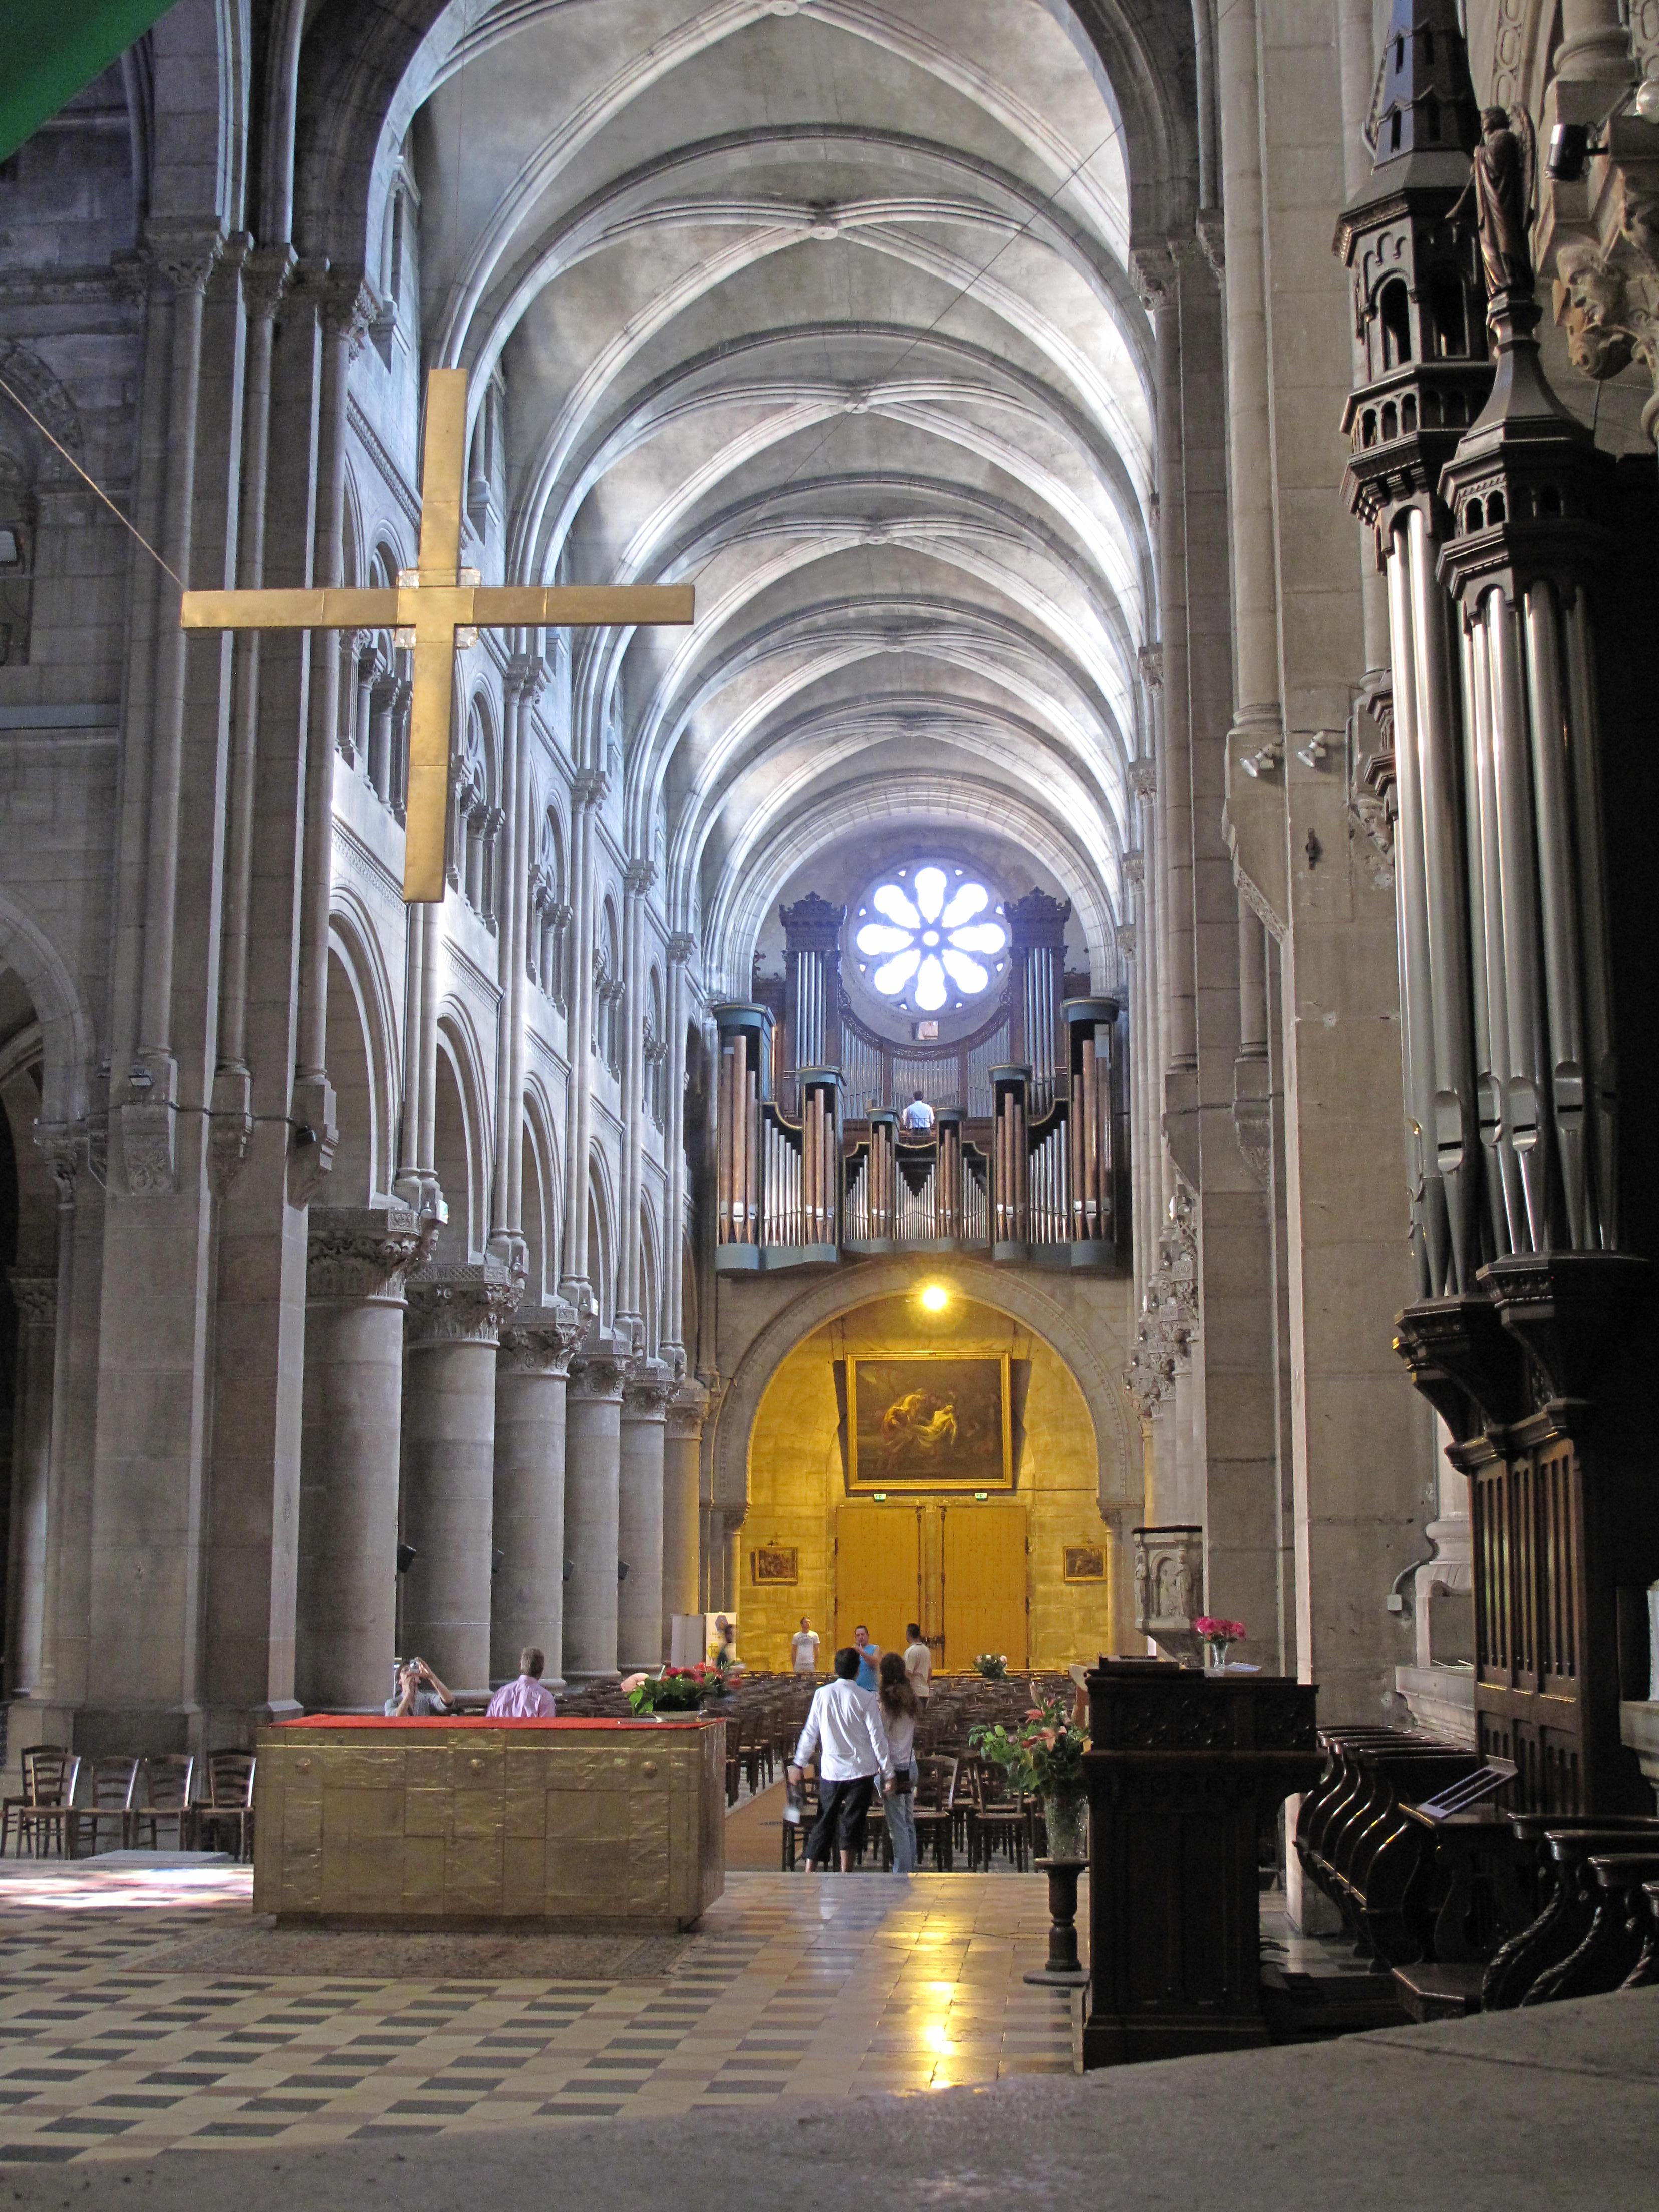 File:Church Saint-Pierre in Macon (nave and organ).jpg